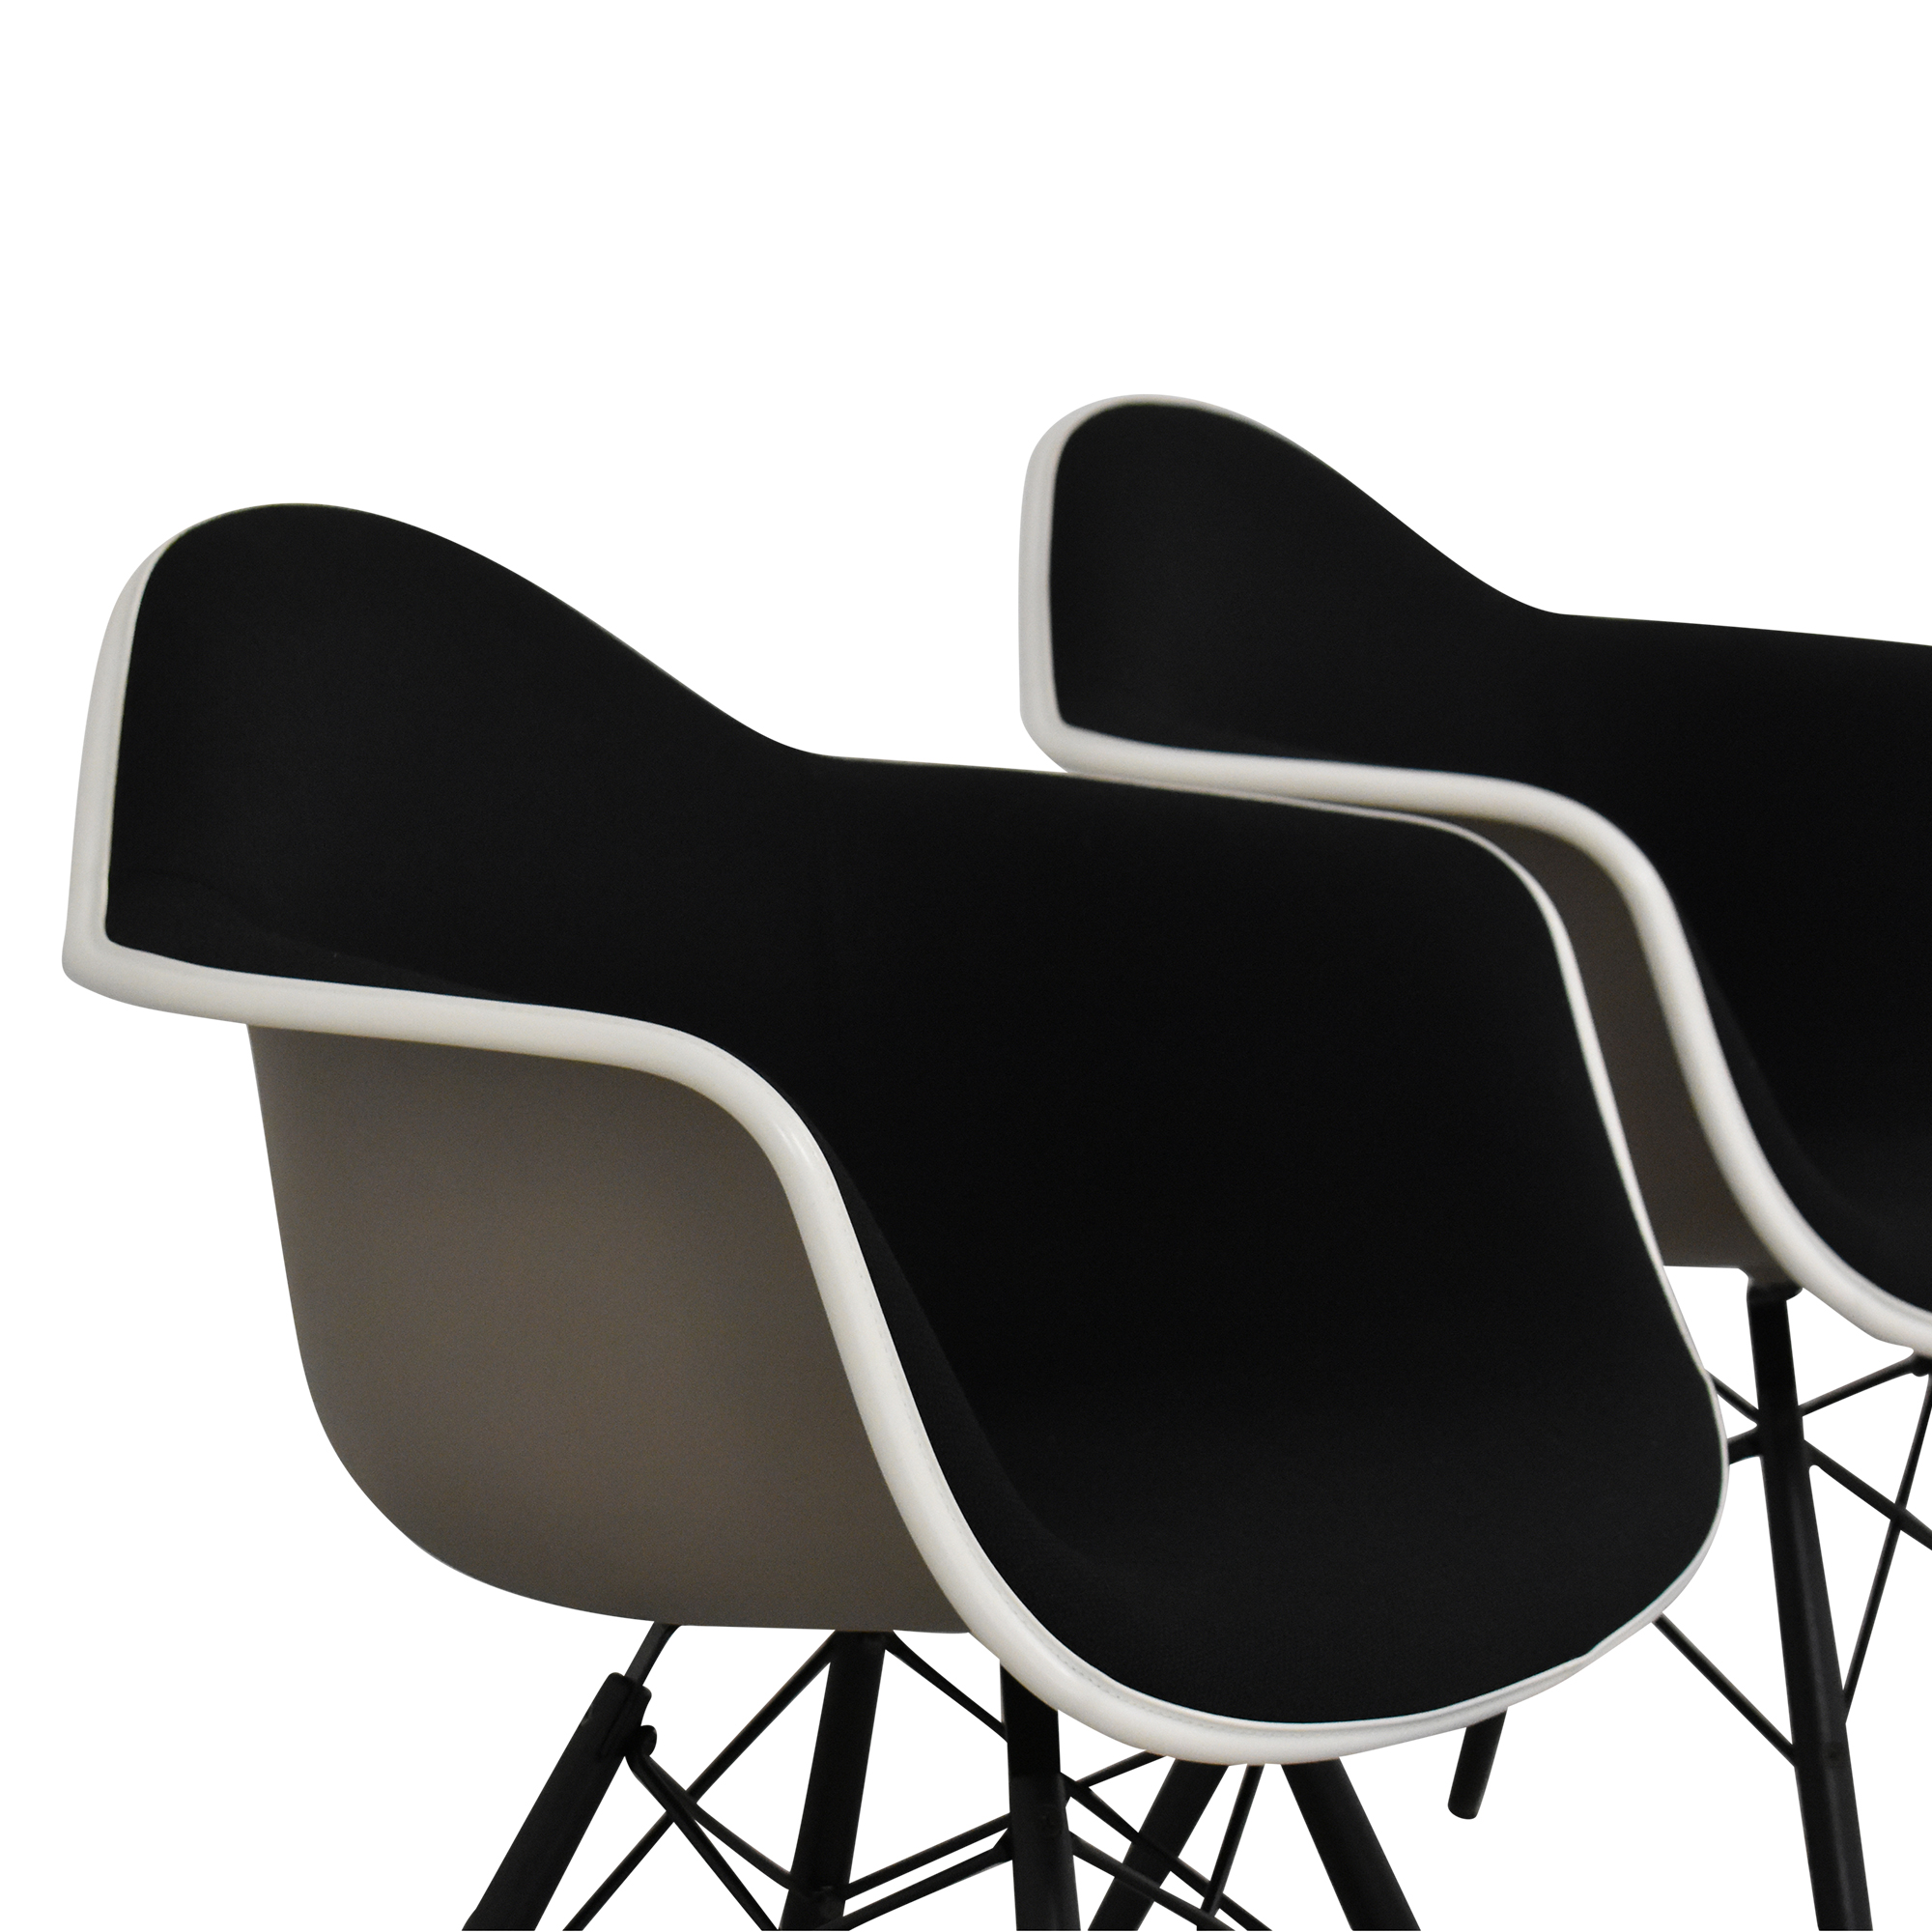 shop Herman Miller Herman Miller Eames Molded Arm Chairs online